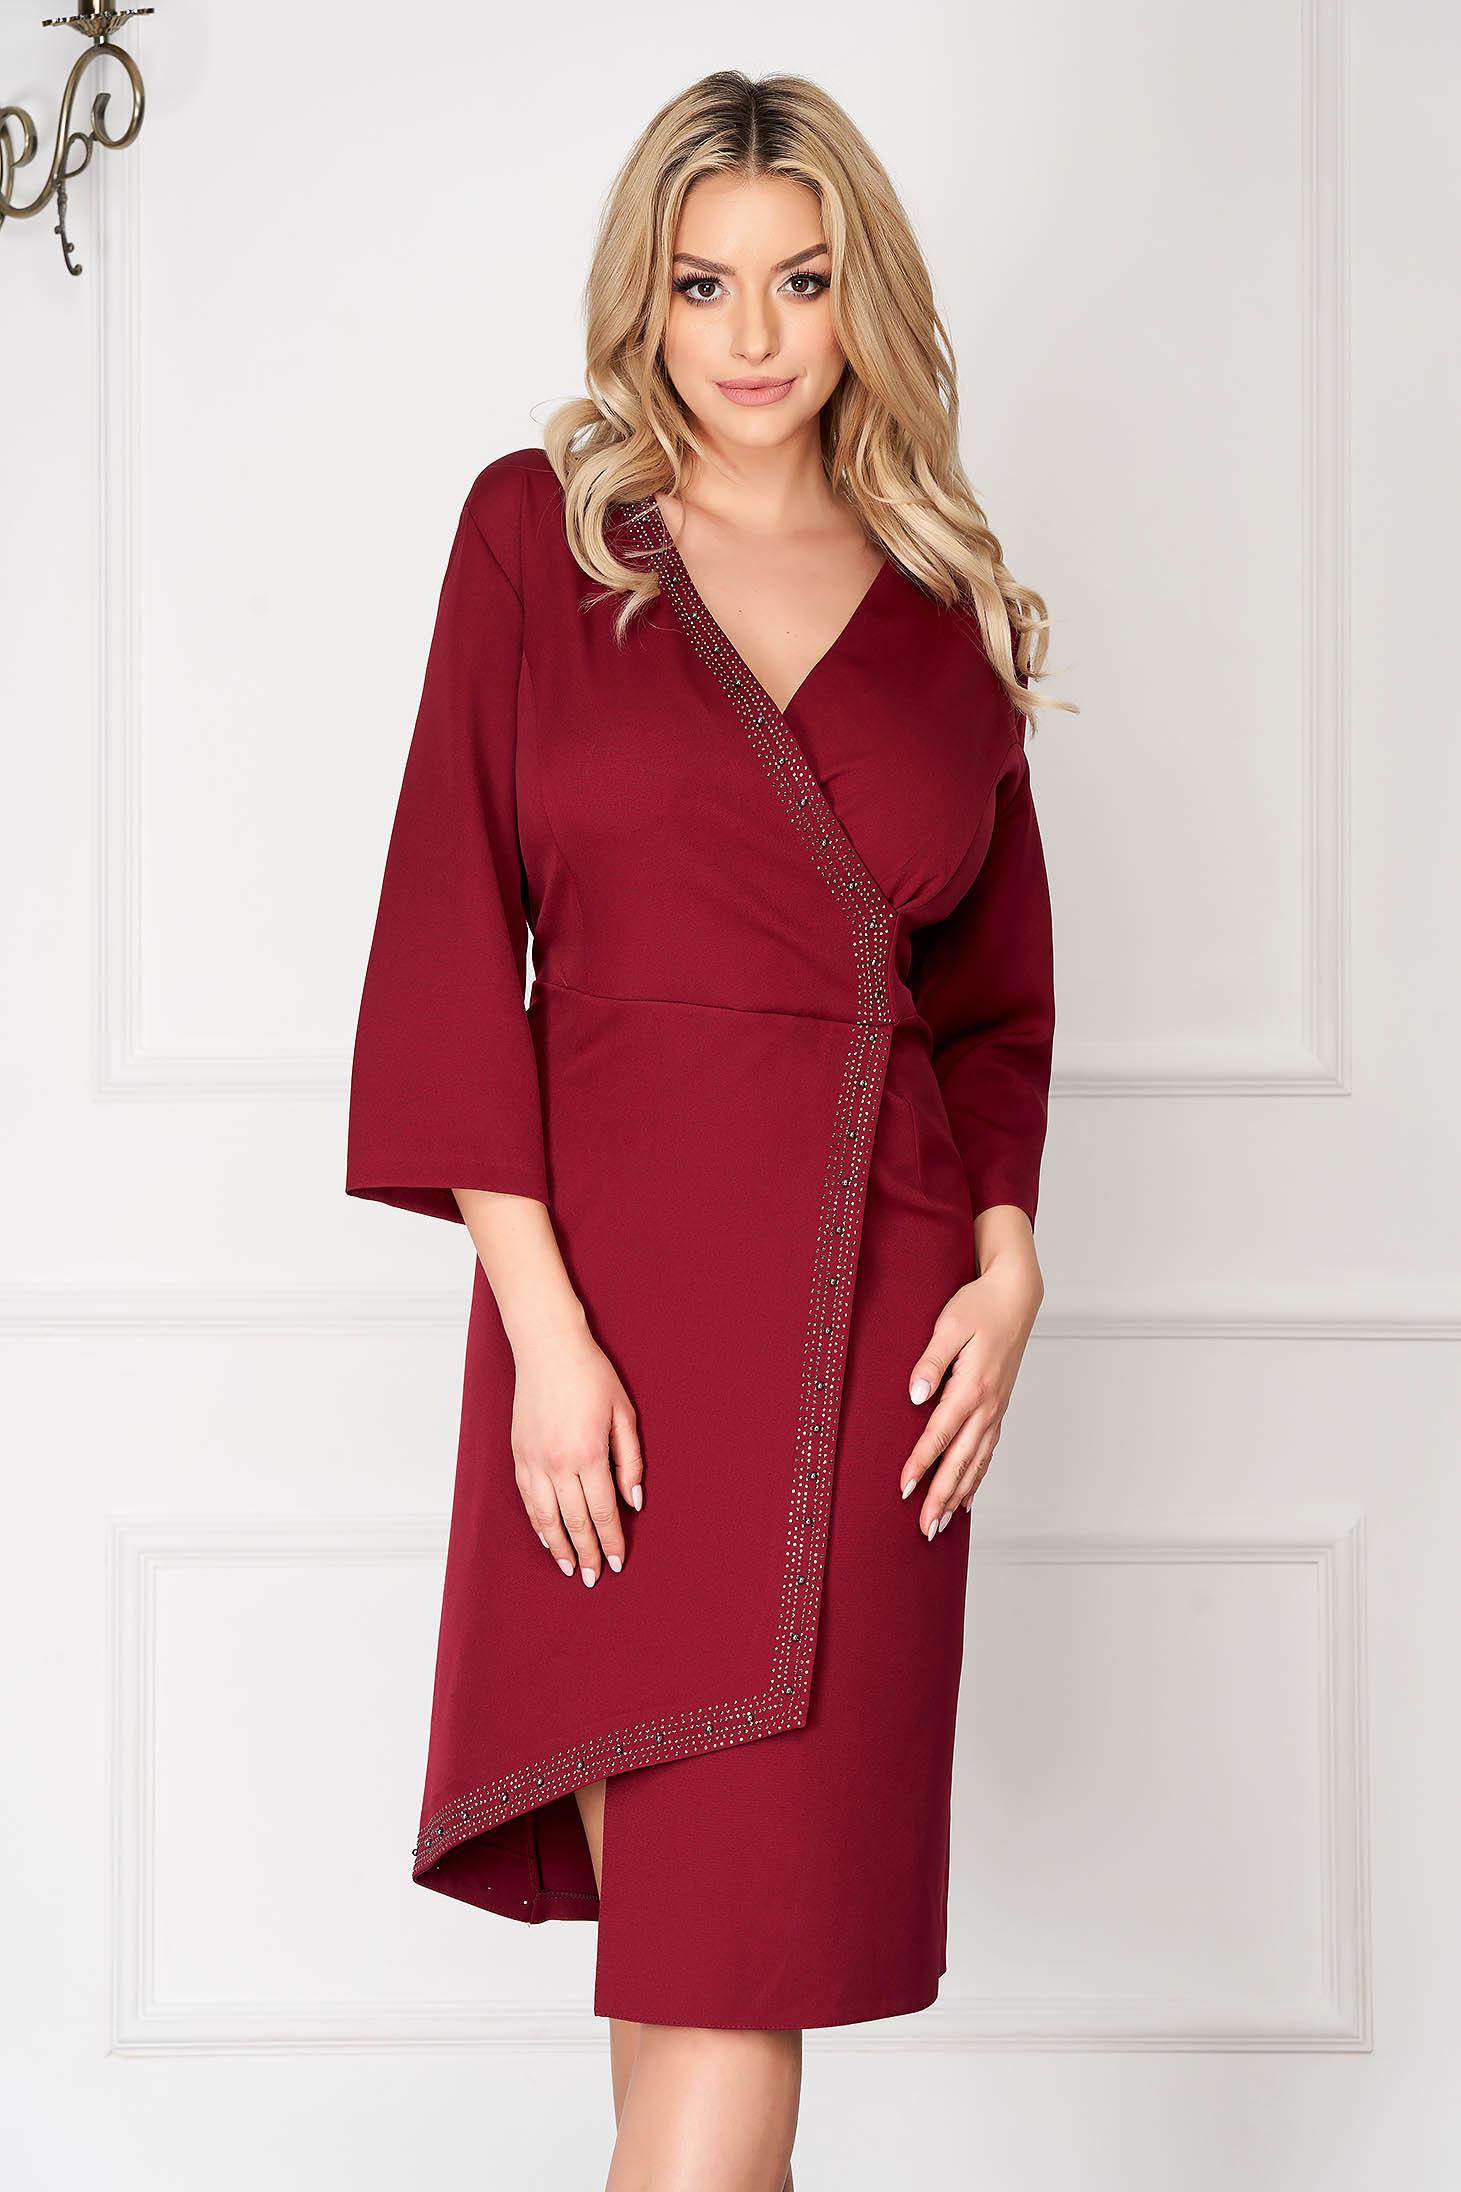 Burgundy elegant asymmetrical midi pencil dress with 3/4 sleeves